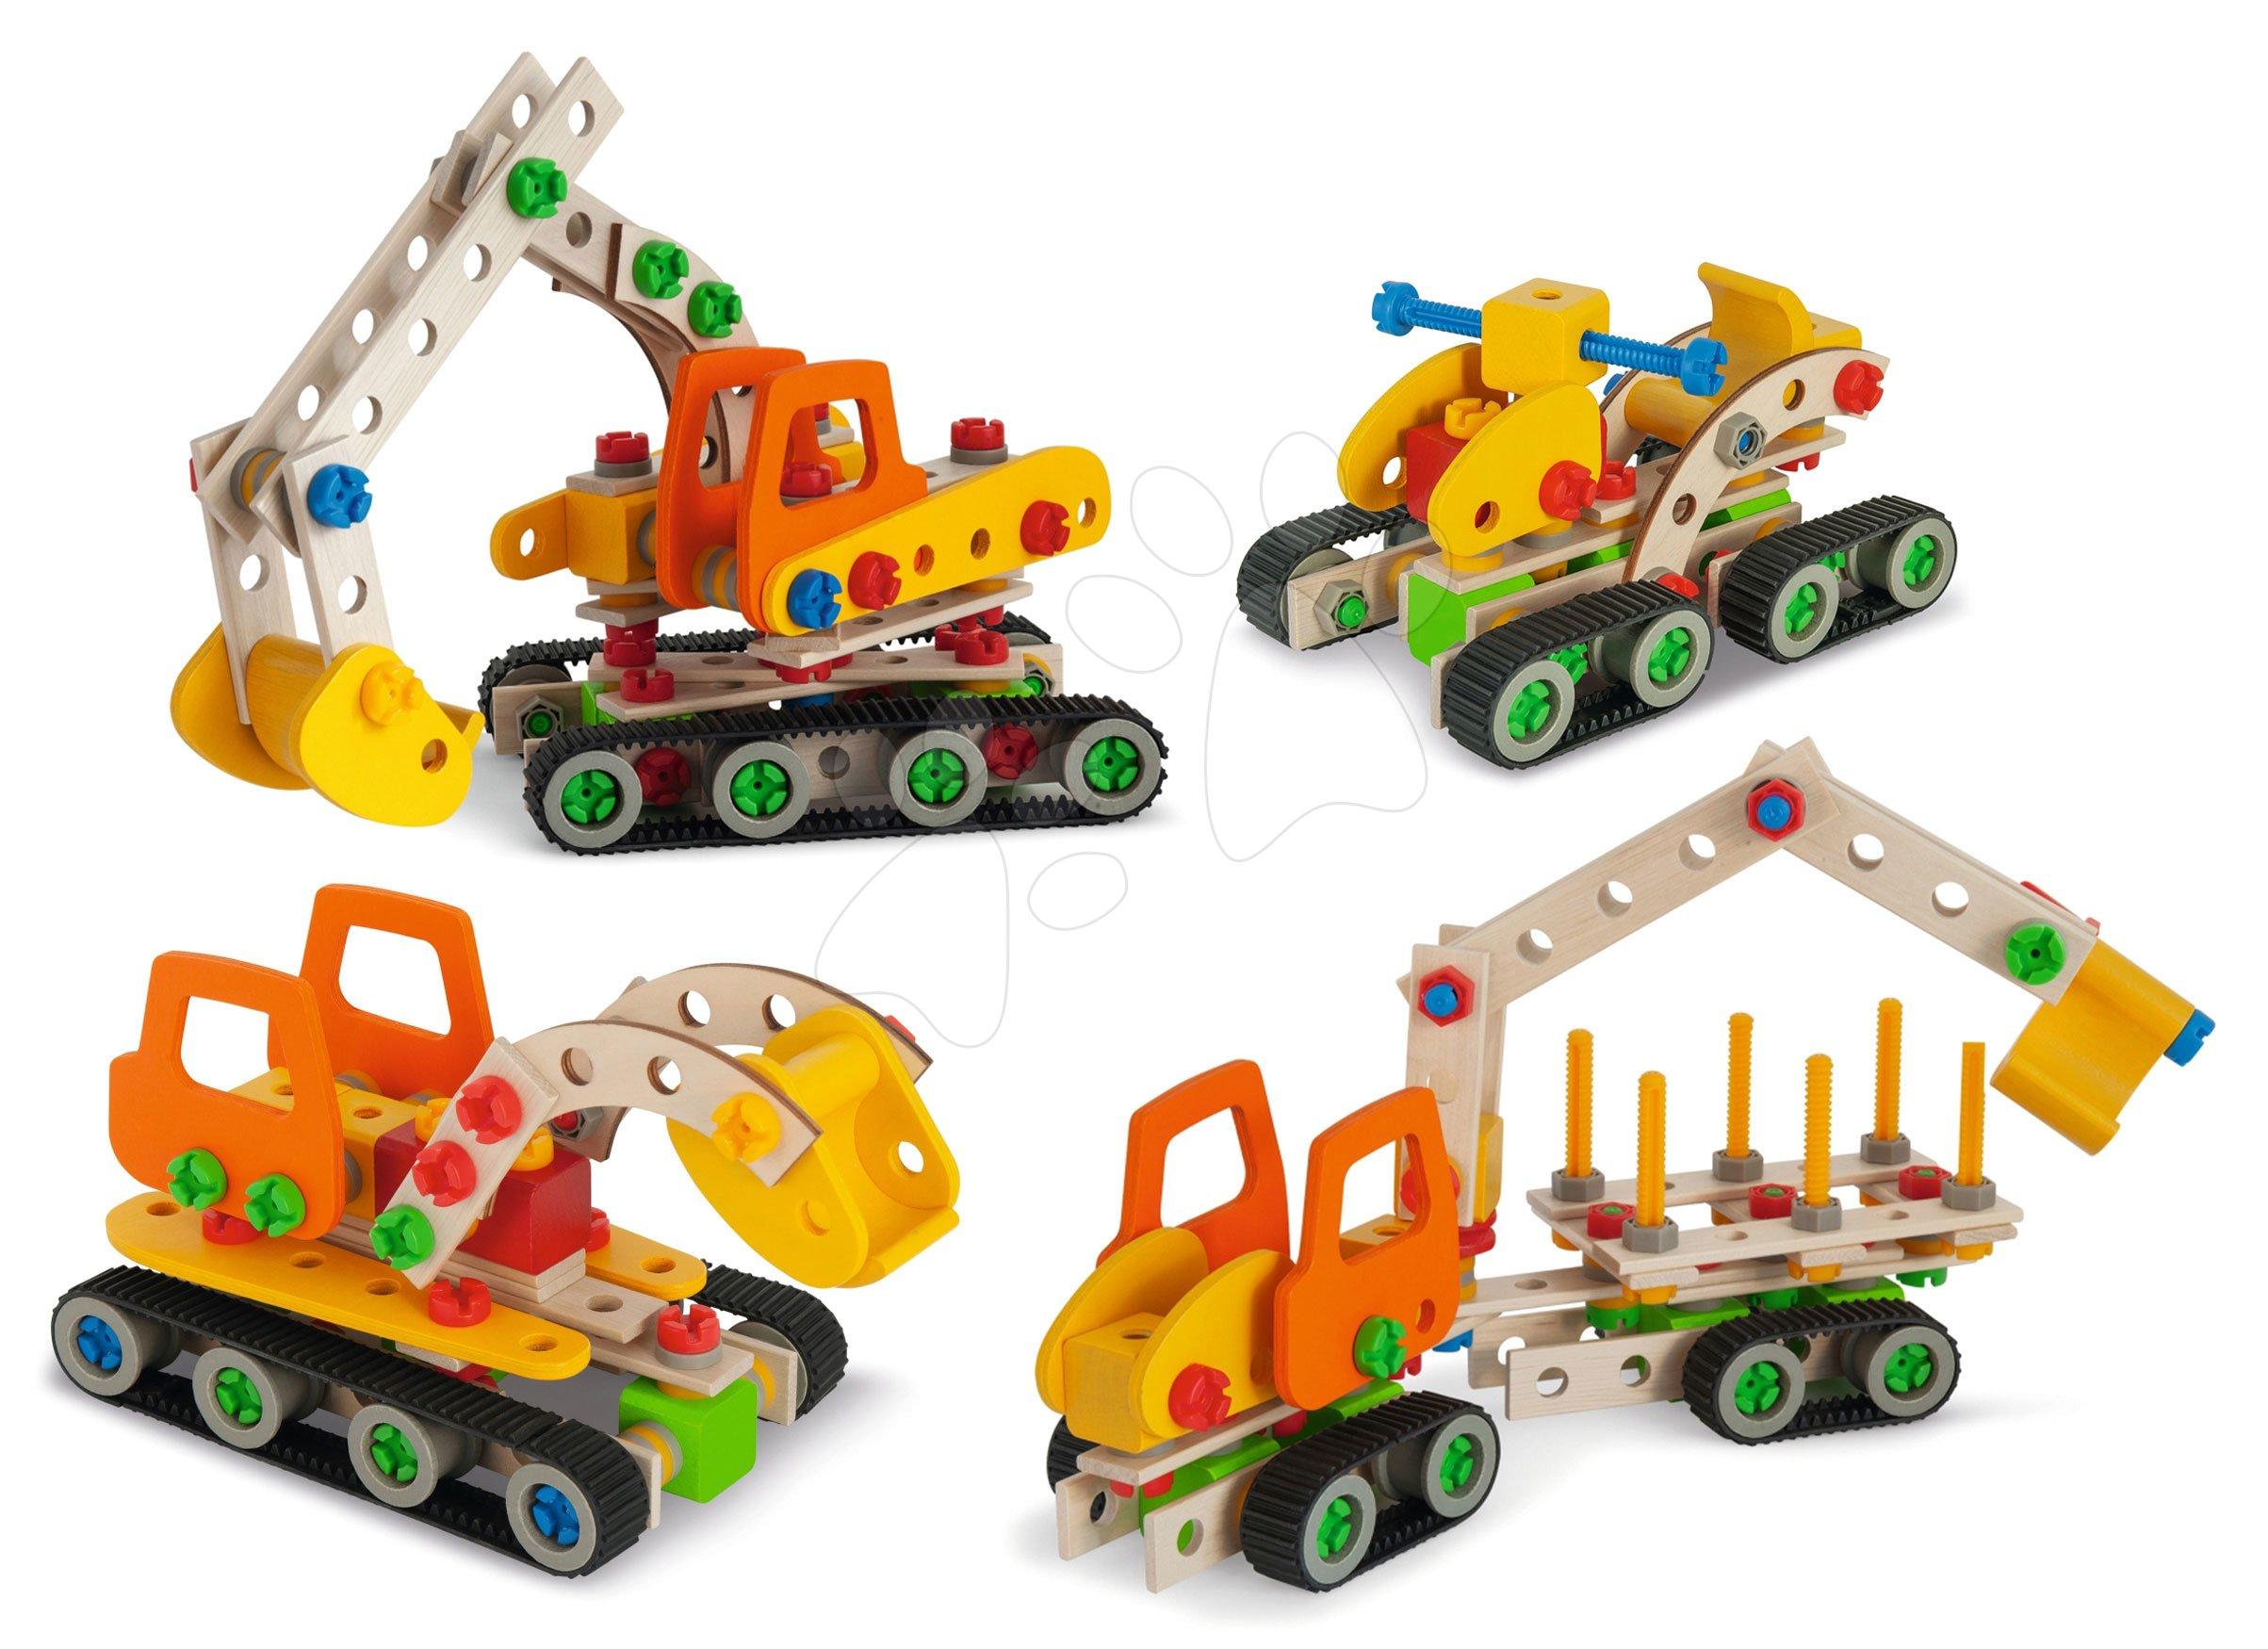 Fa építőjáték mobildaru Constructor Crawler Excavator Eichhorn 4 modell (daru, mobildaru, vagon, hójáró) 170 elem 6 évtől